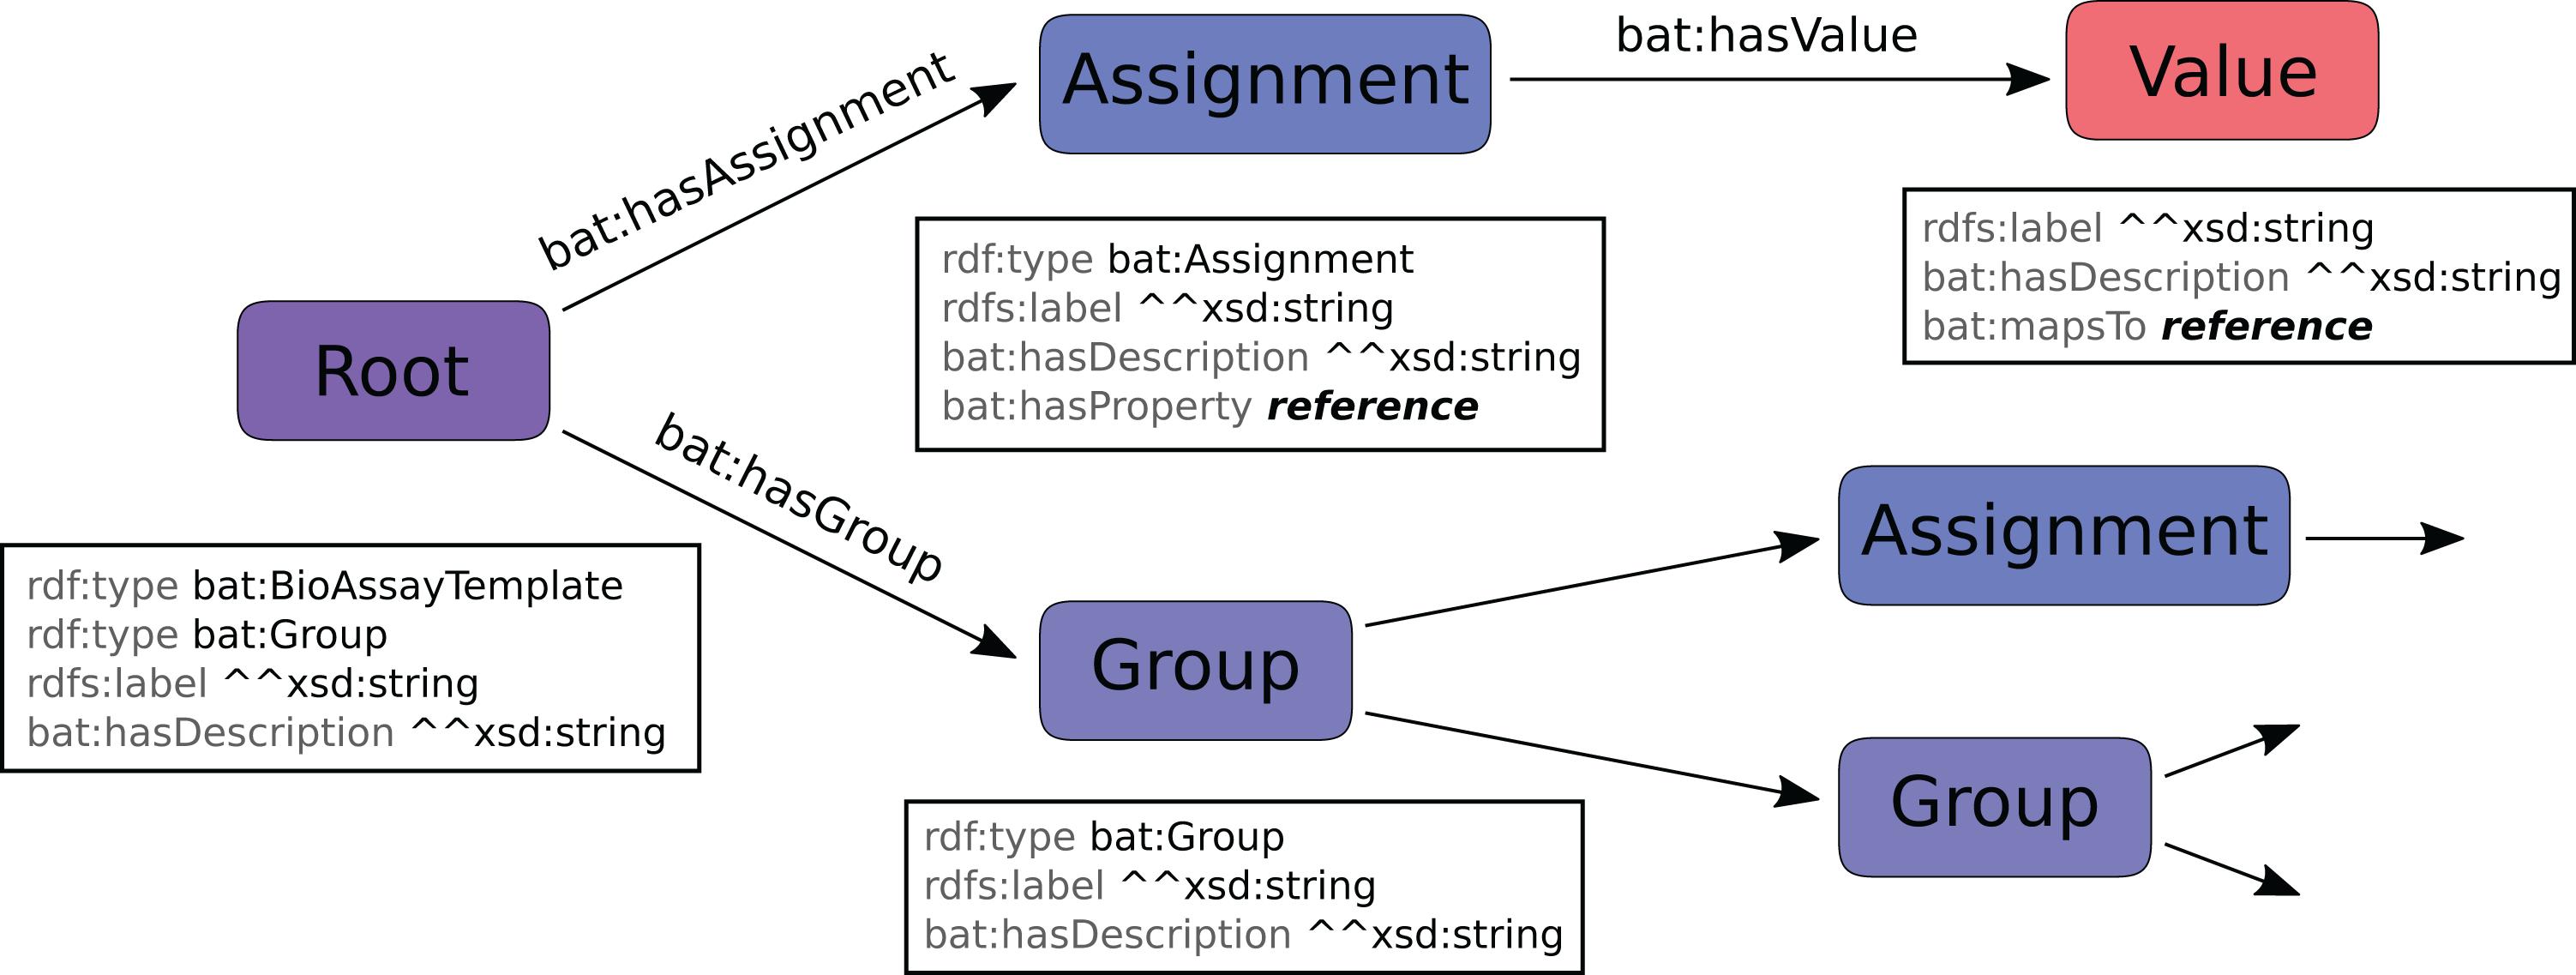 BioAssay templates for the semantic web [PeerJ]